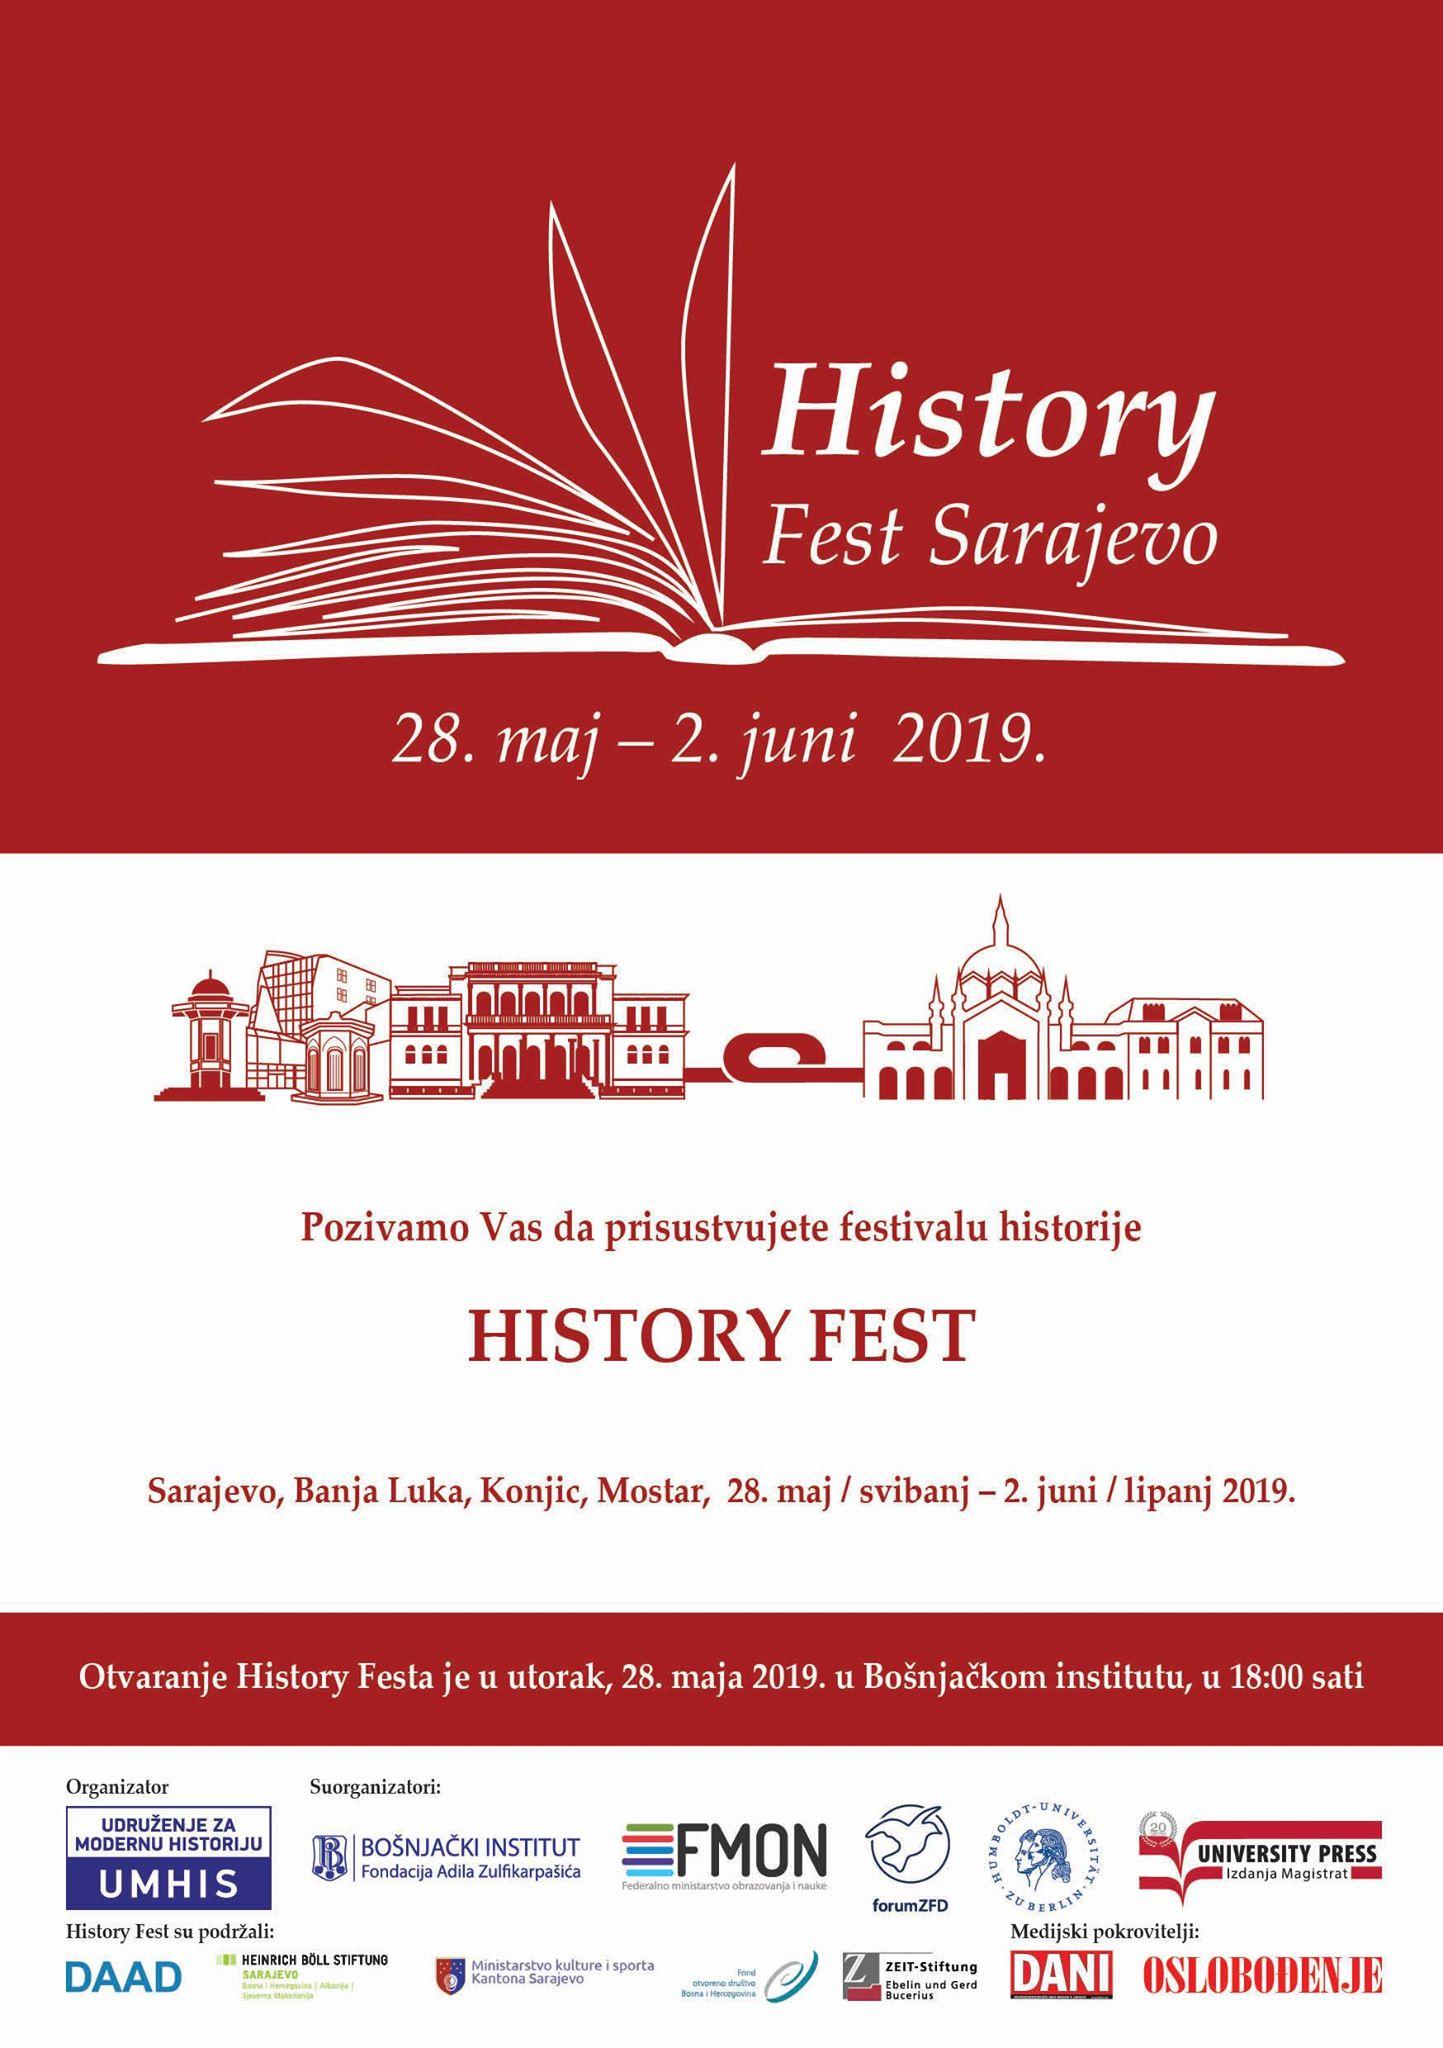 History Fest